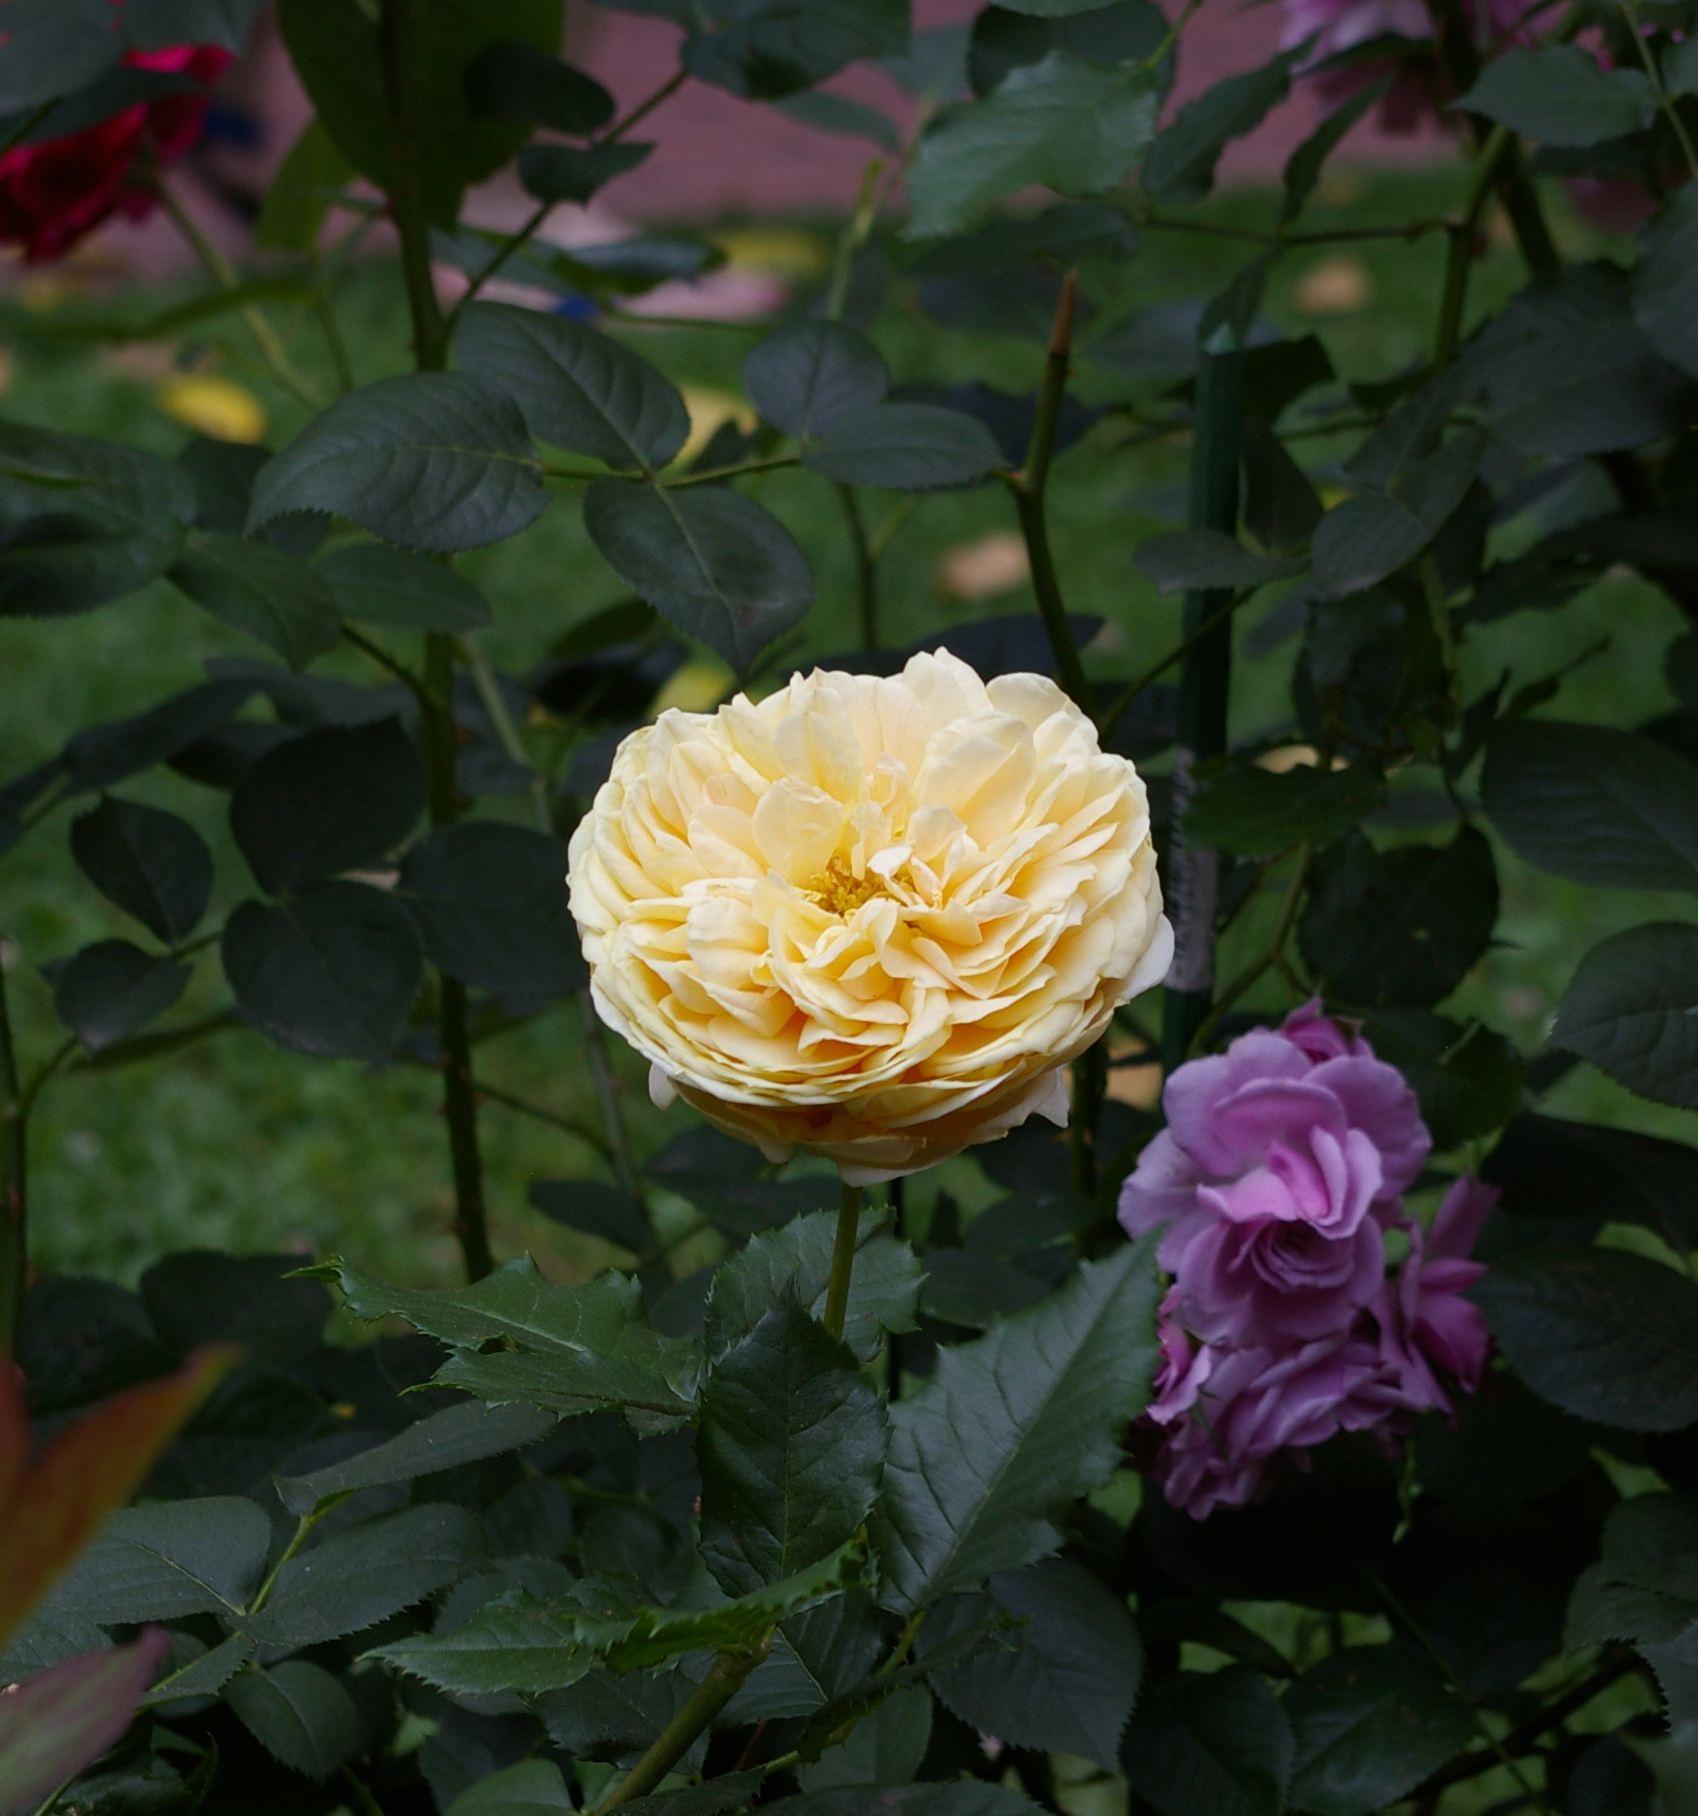 Delicate cream colored rose